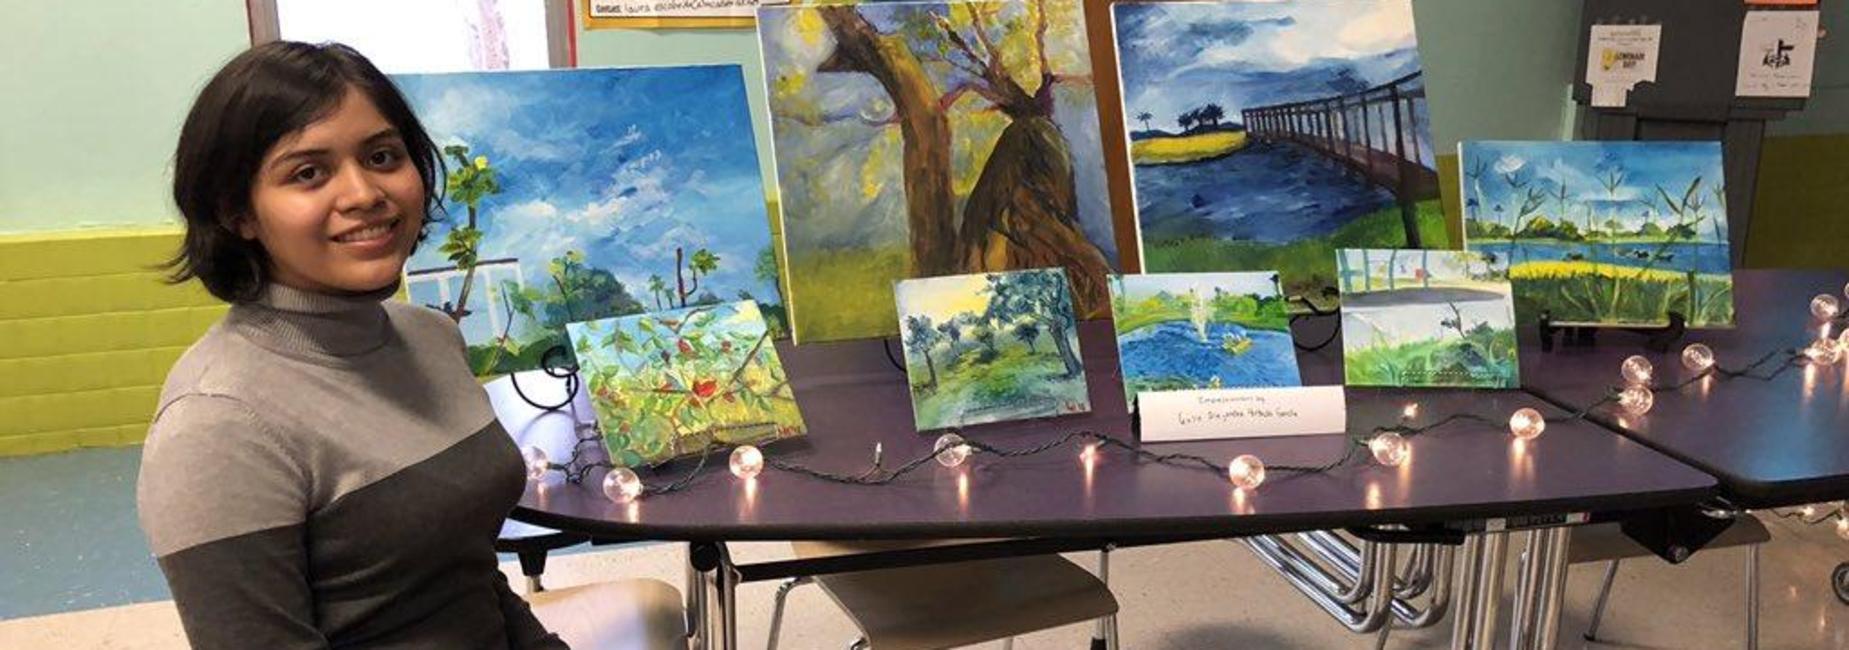 Lamar Student and her artwork